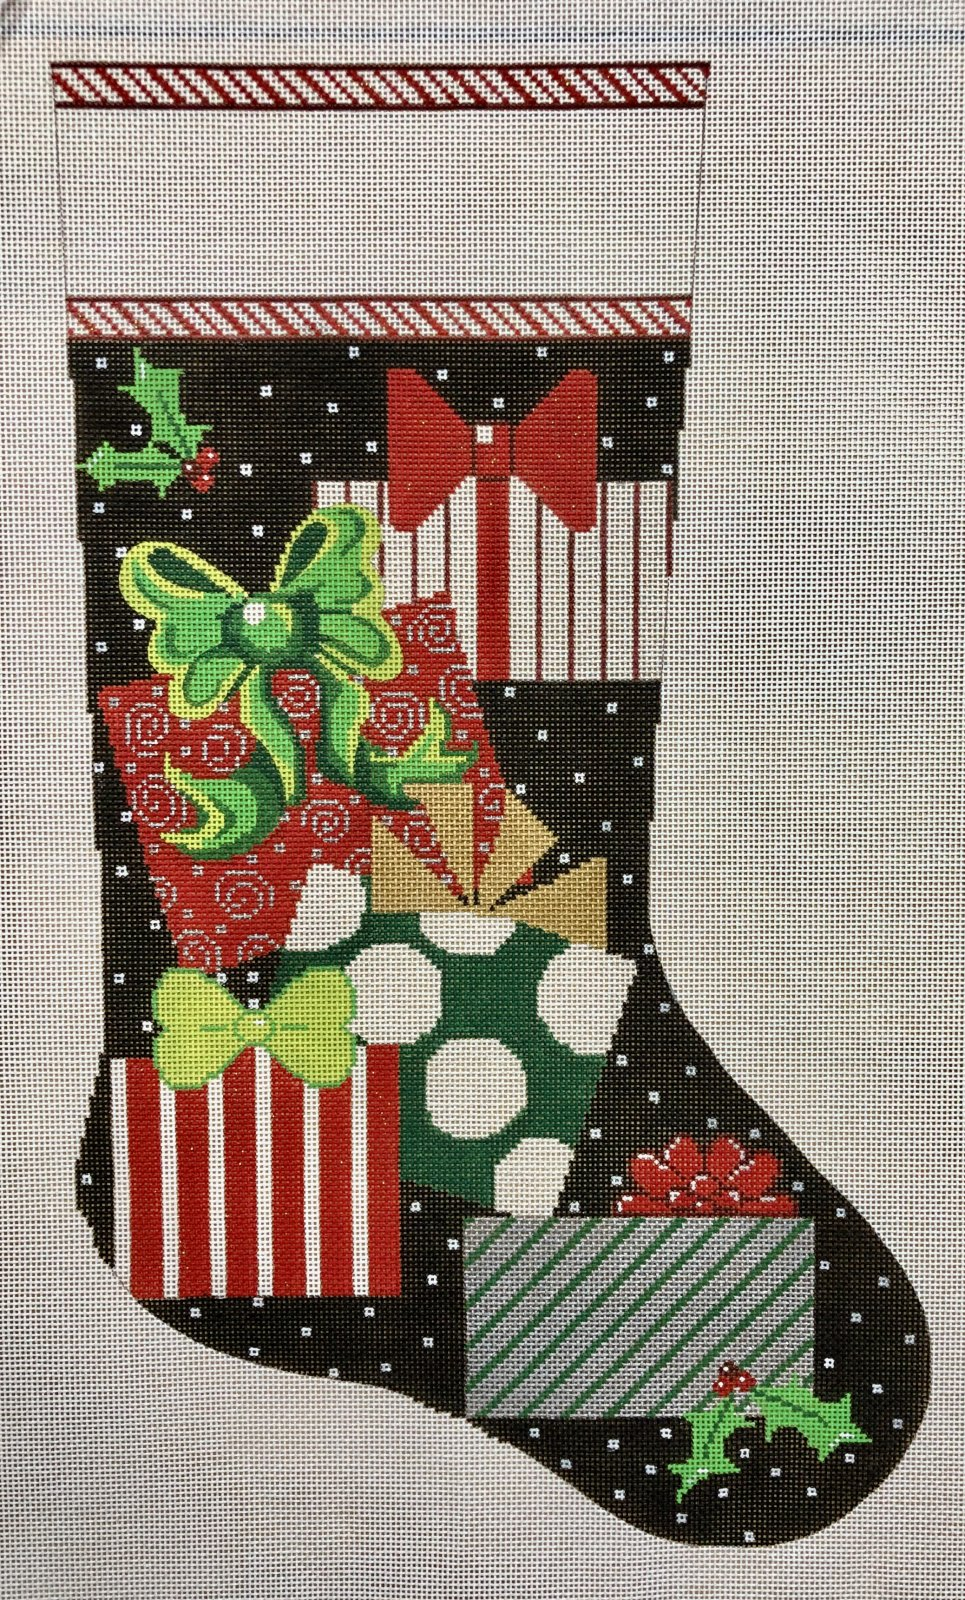 presents on black stocking